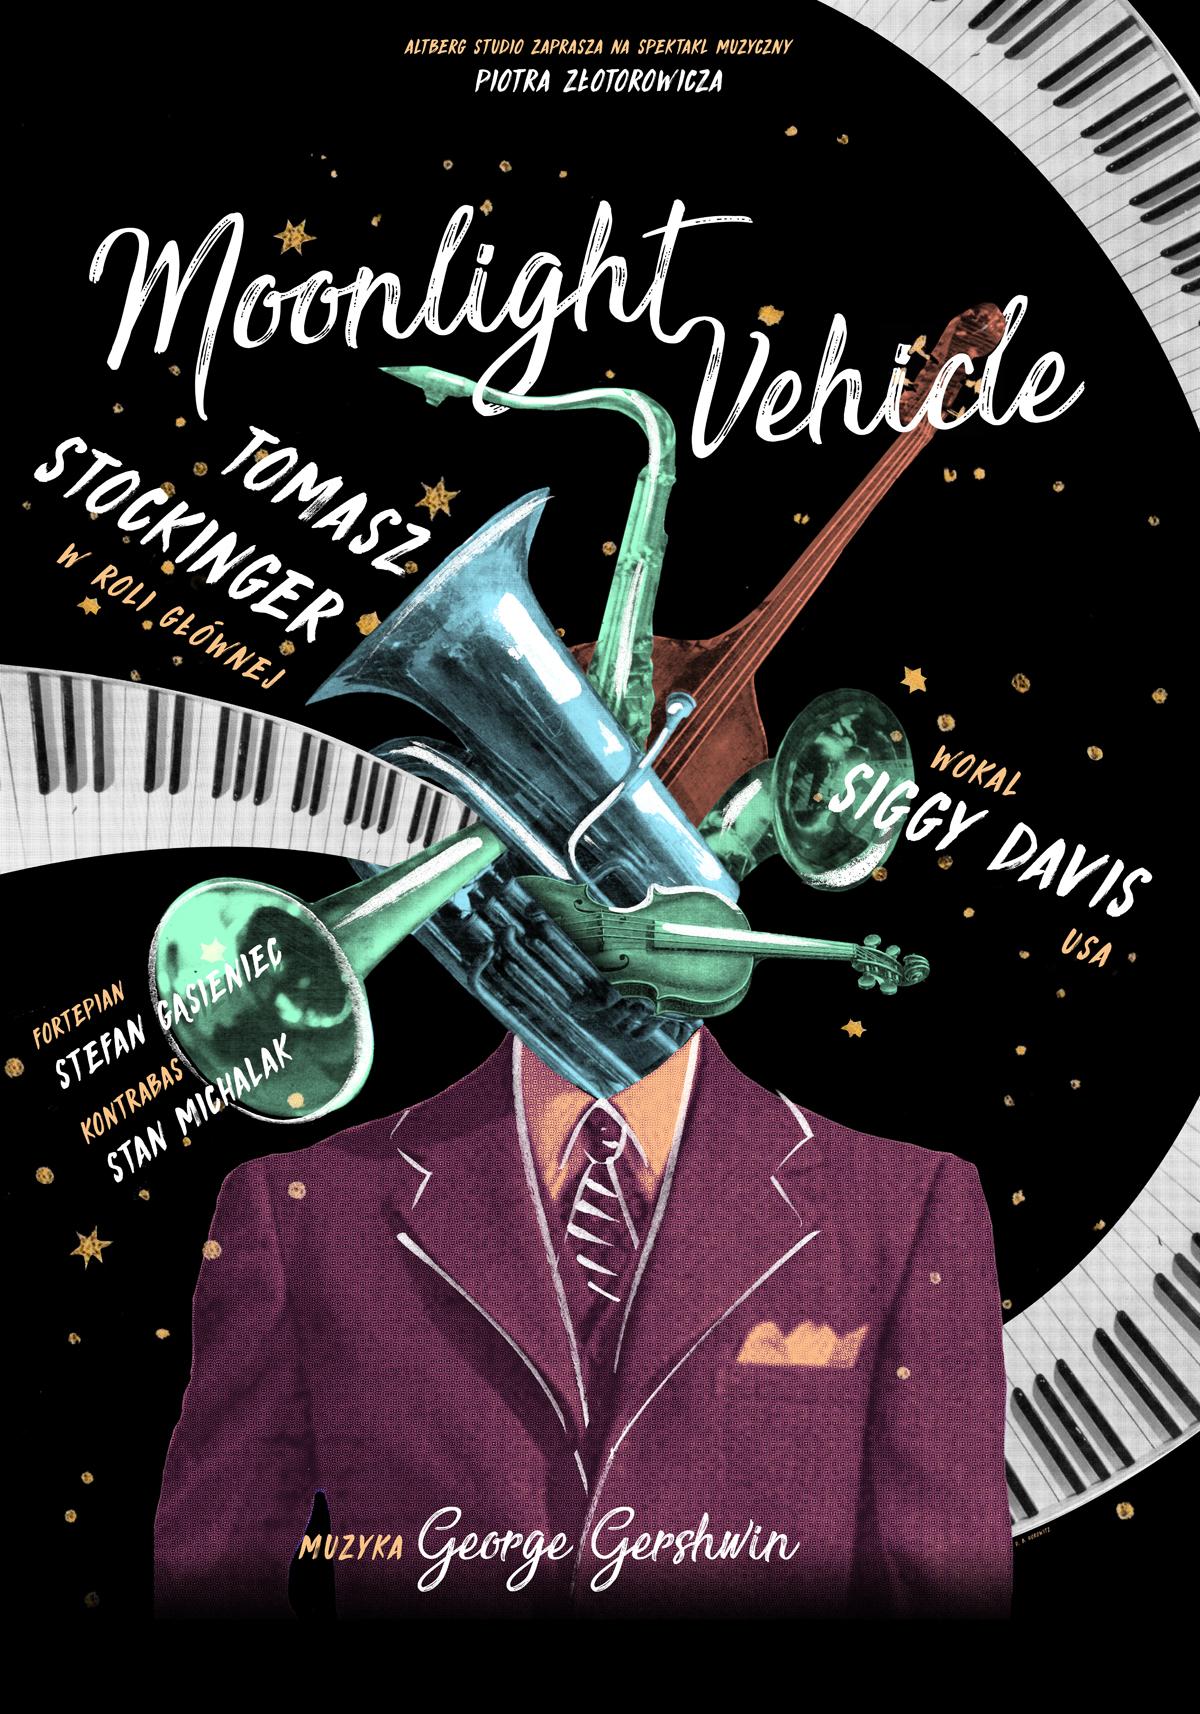 Moonlight Vehicle